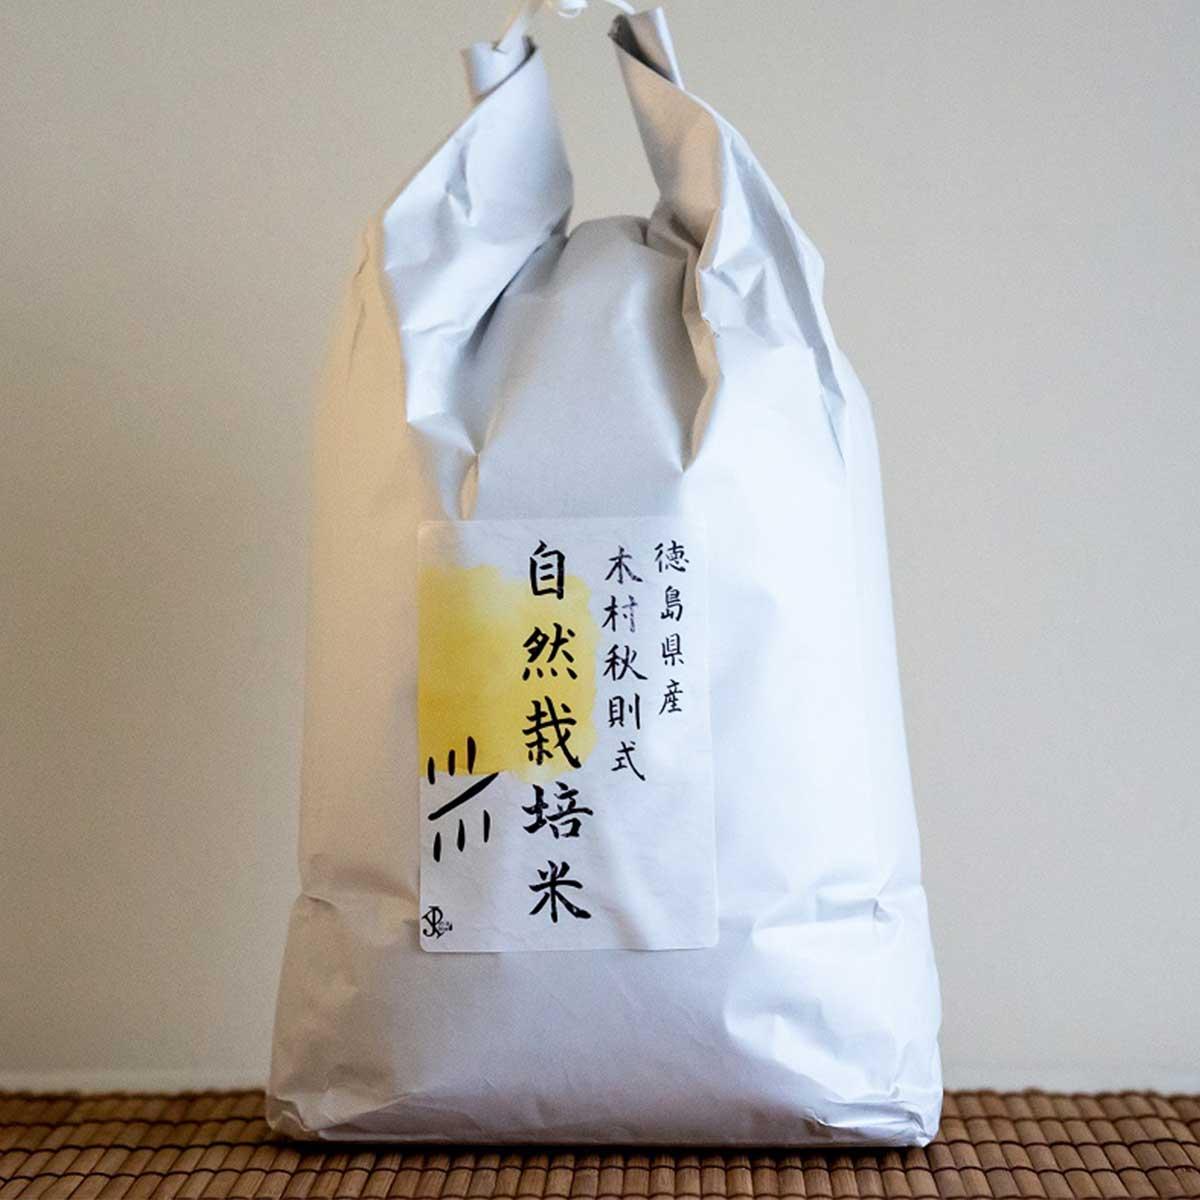 OrganicGarden 美味しい関係 玄米 徳島県産 農薬・肥料不使用 自然 ...